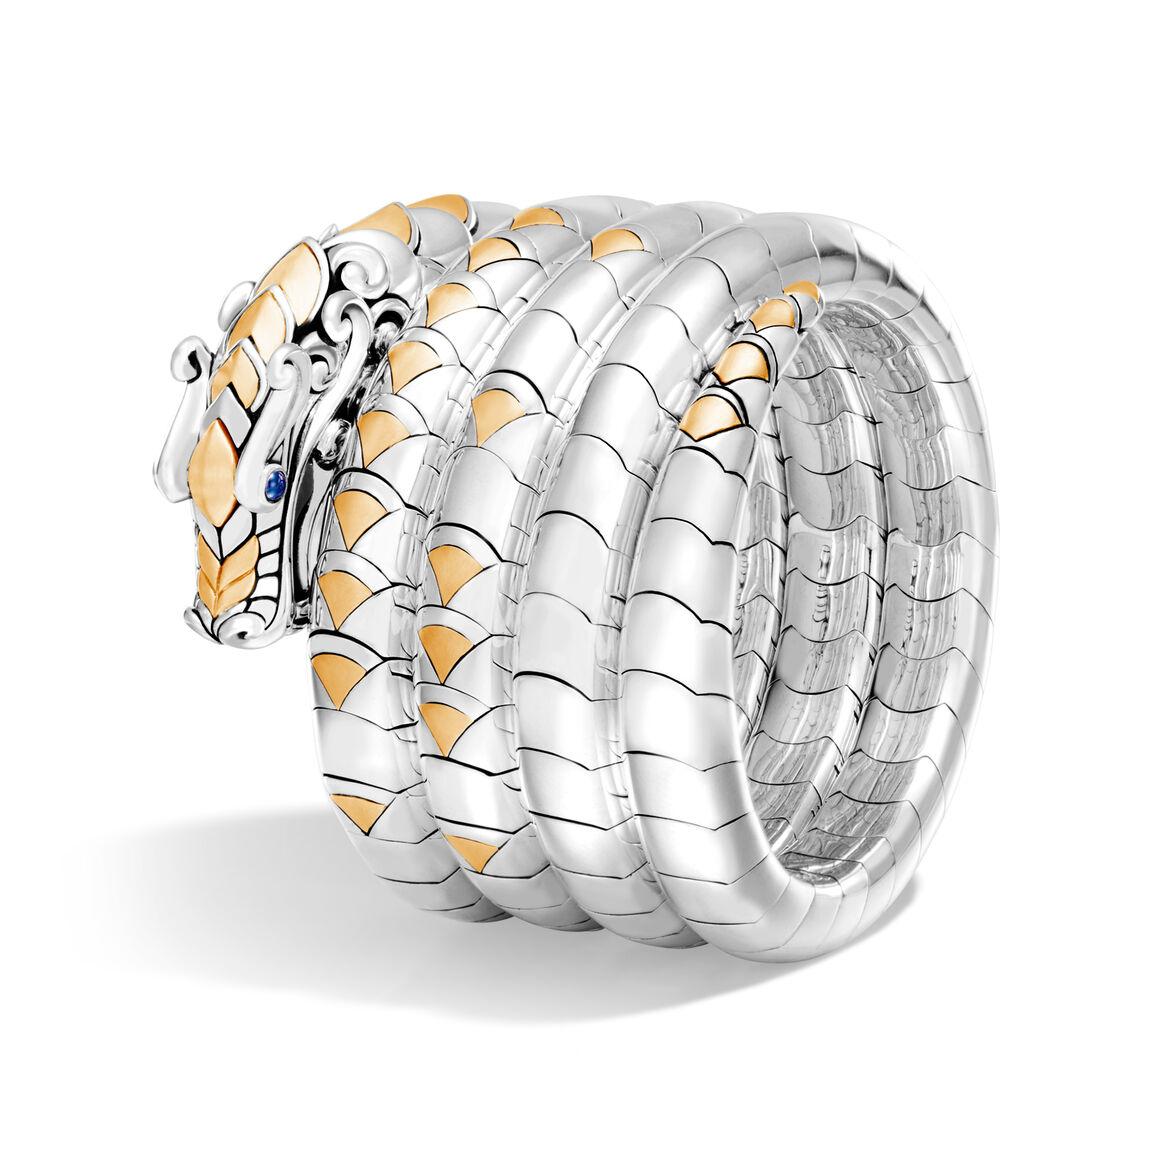 Legends Naga Multi Coil Bracelet in Silver and 18K Gold